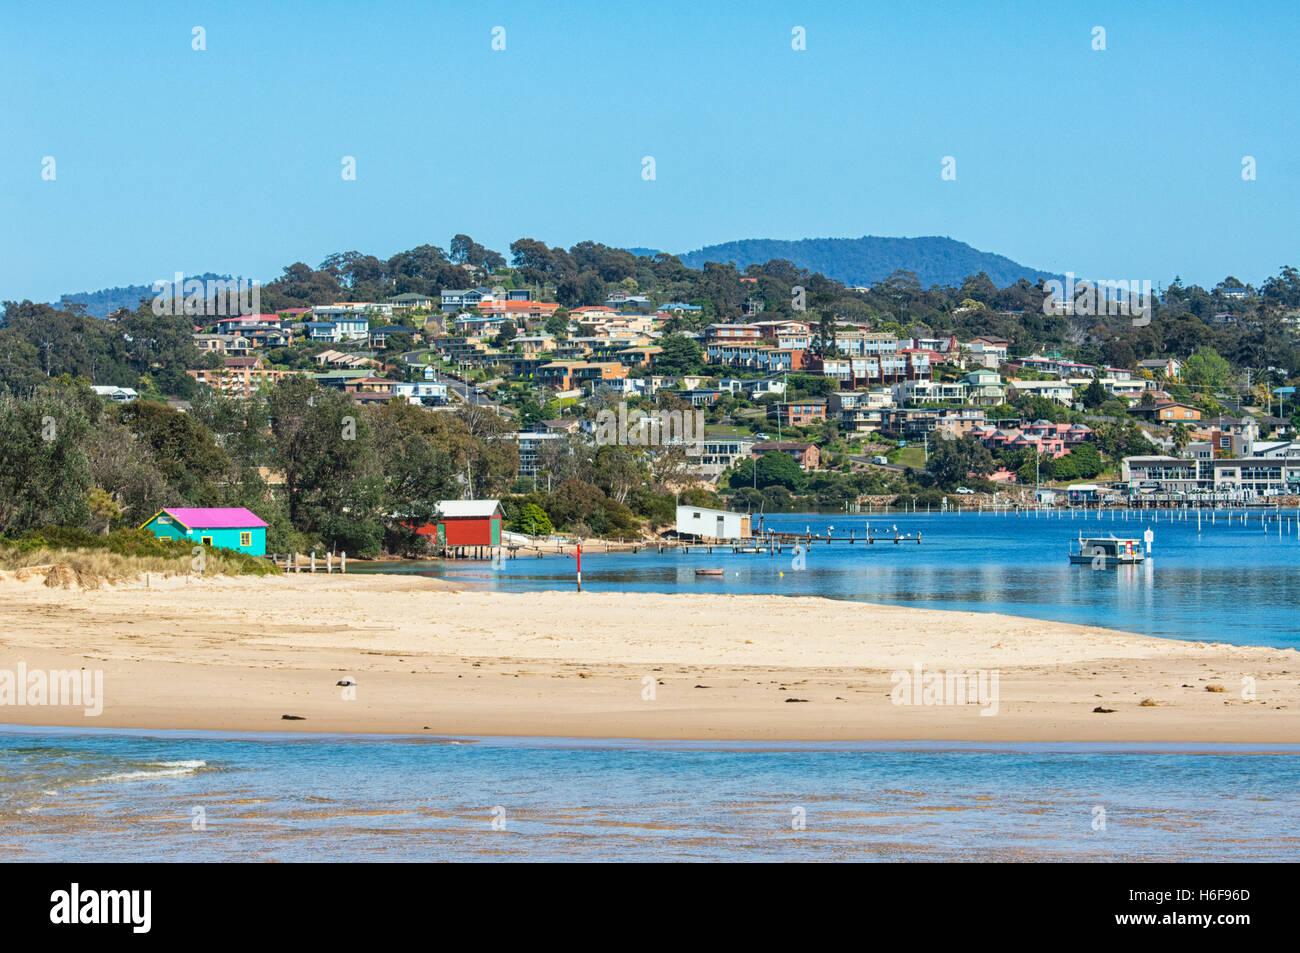 Merimbula, Sapphire Coast, New South Wales, NSW, Australien Stockbild